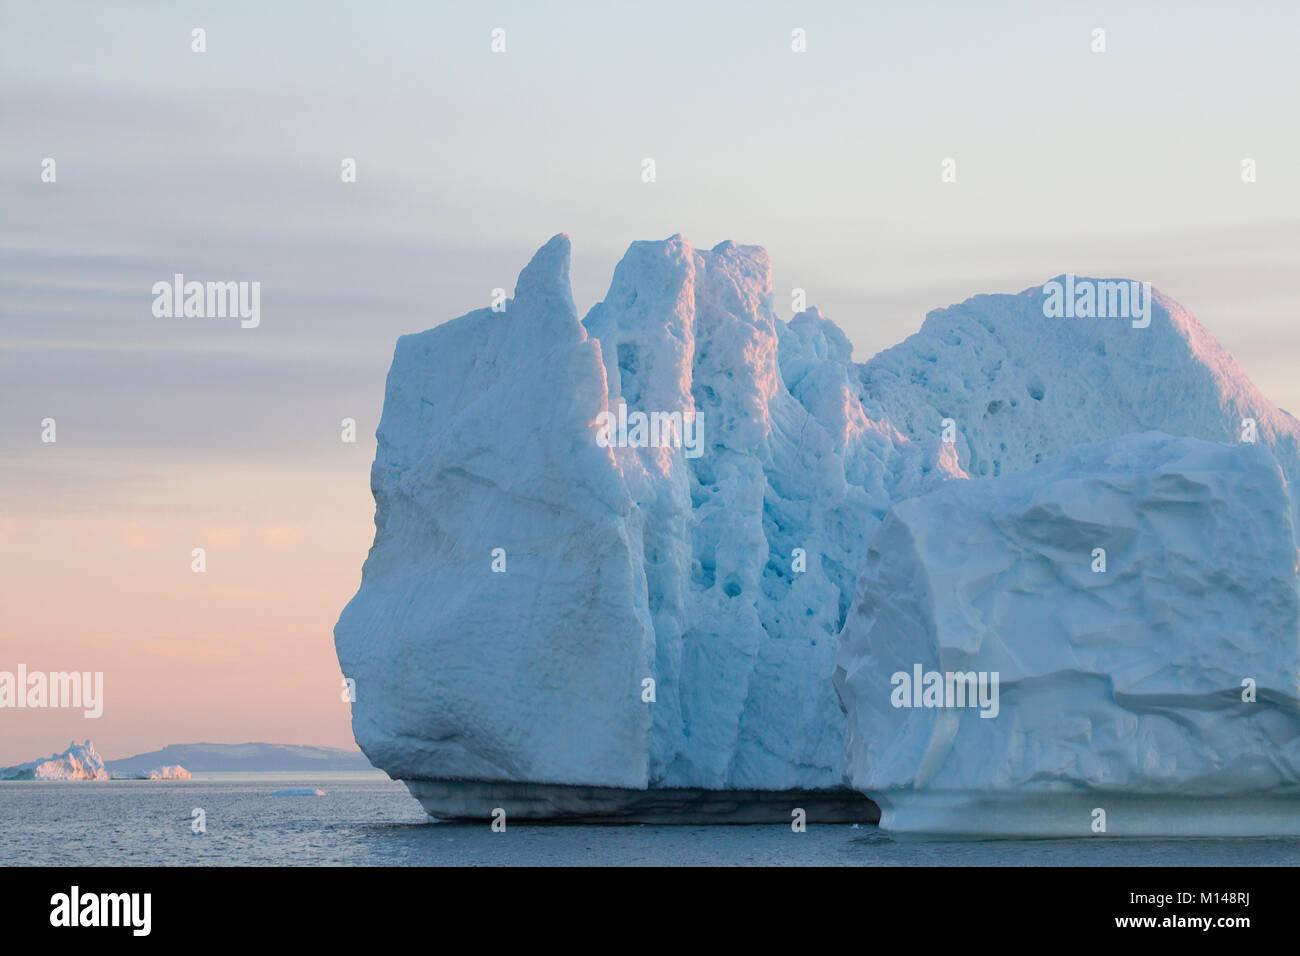 Icebergs from the icefjord, Ilulissat, Disko Bay, Greenland, Polar Regions - Stock Image